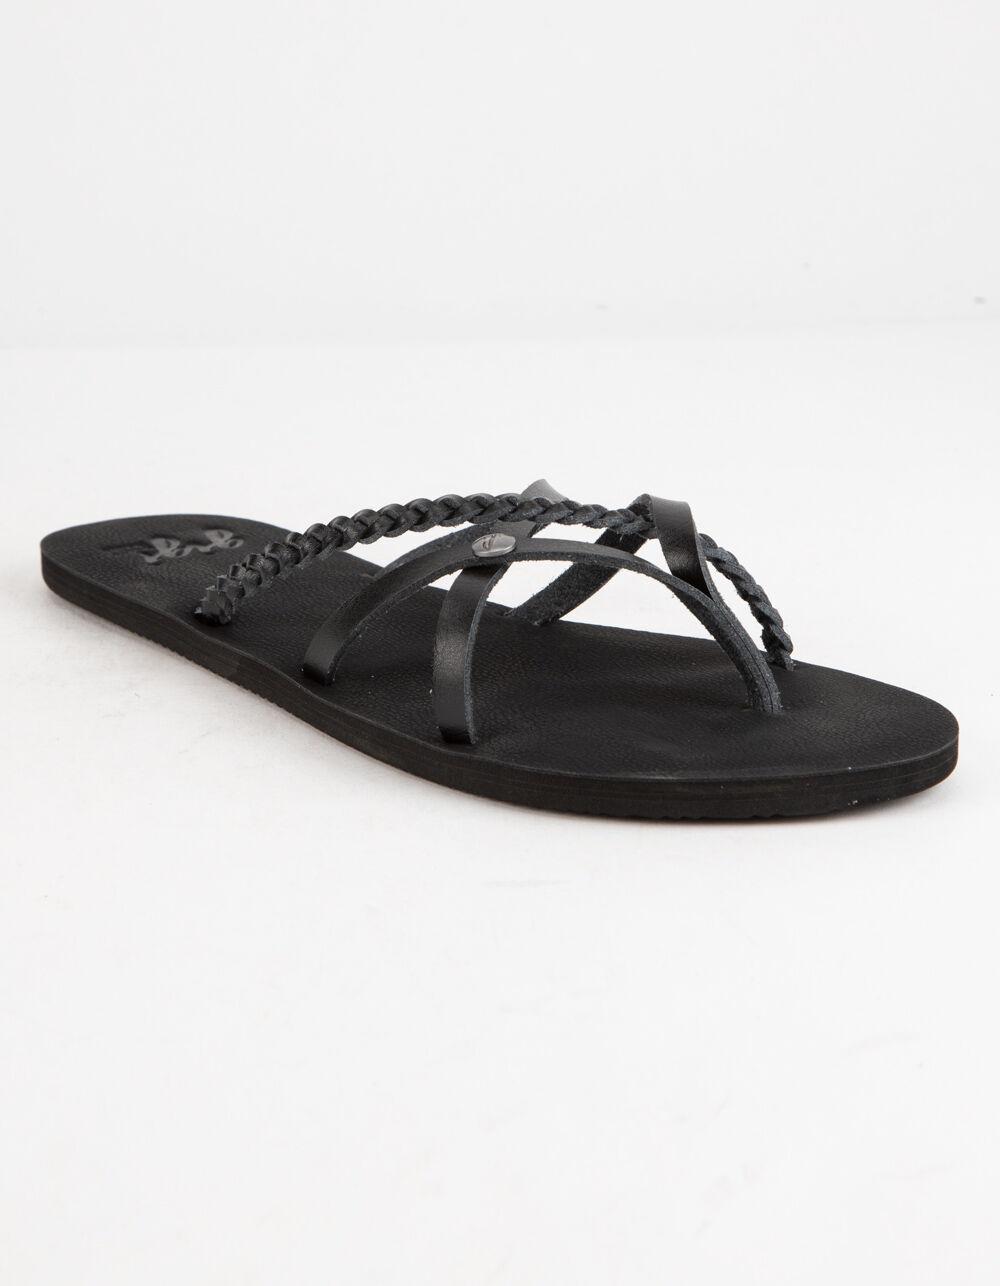 GIGI Criss Cross Black Sandals